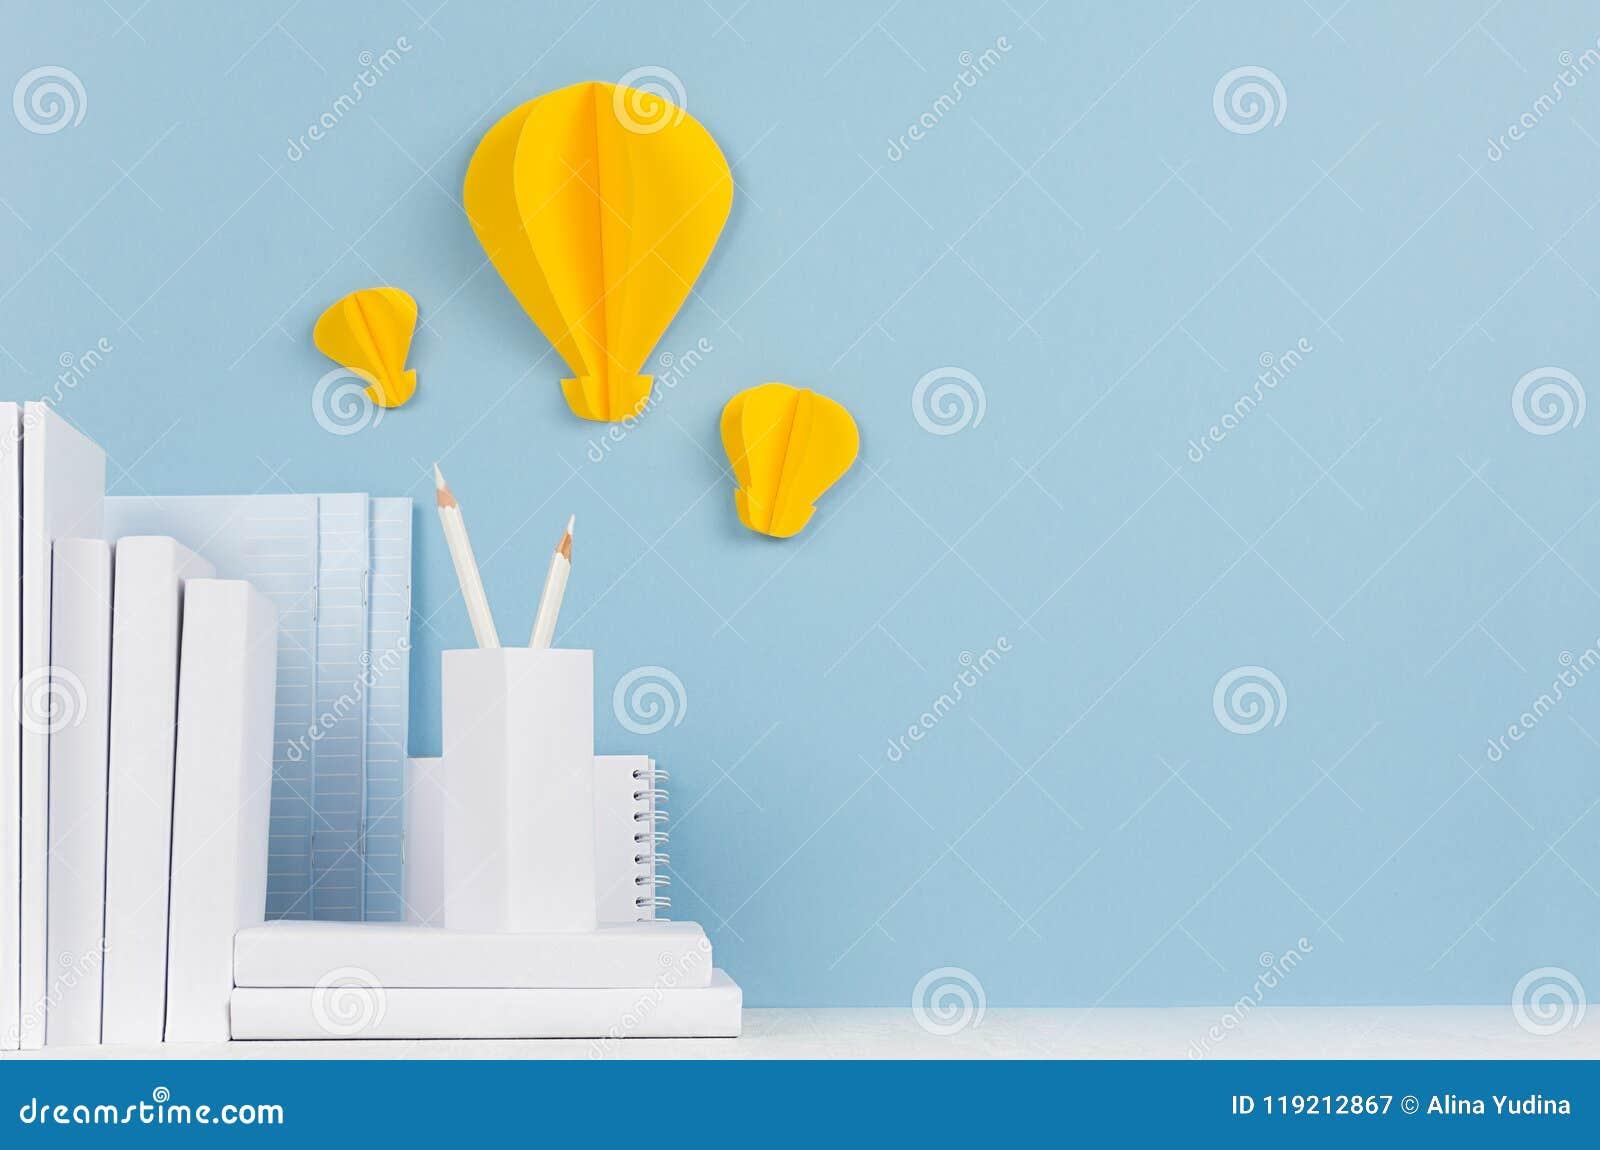 school template white books stationery decorative paper yellow